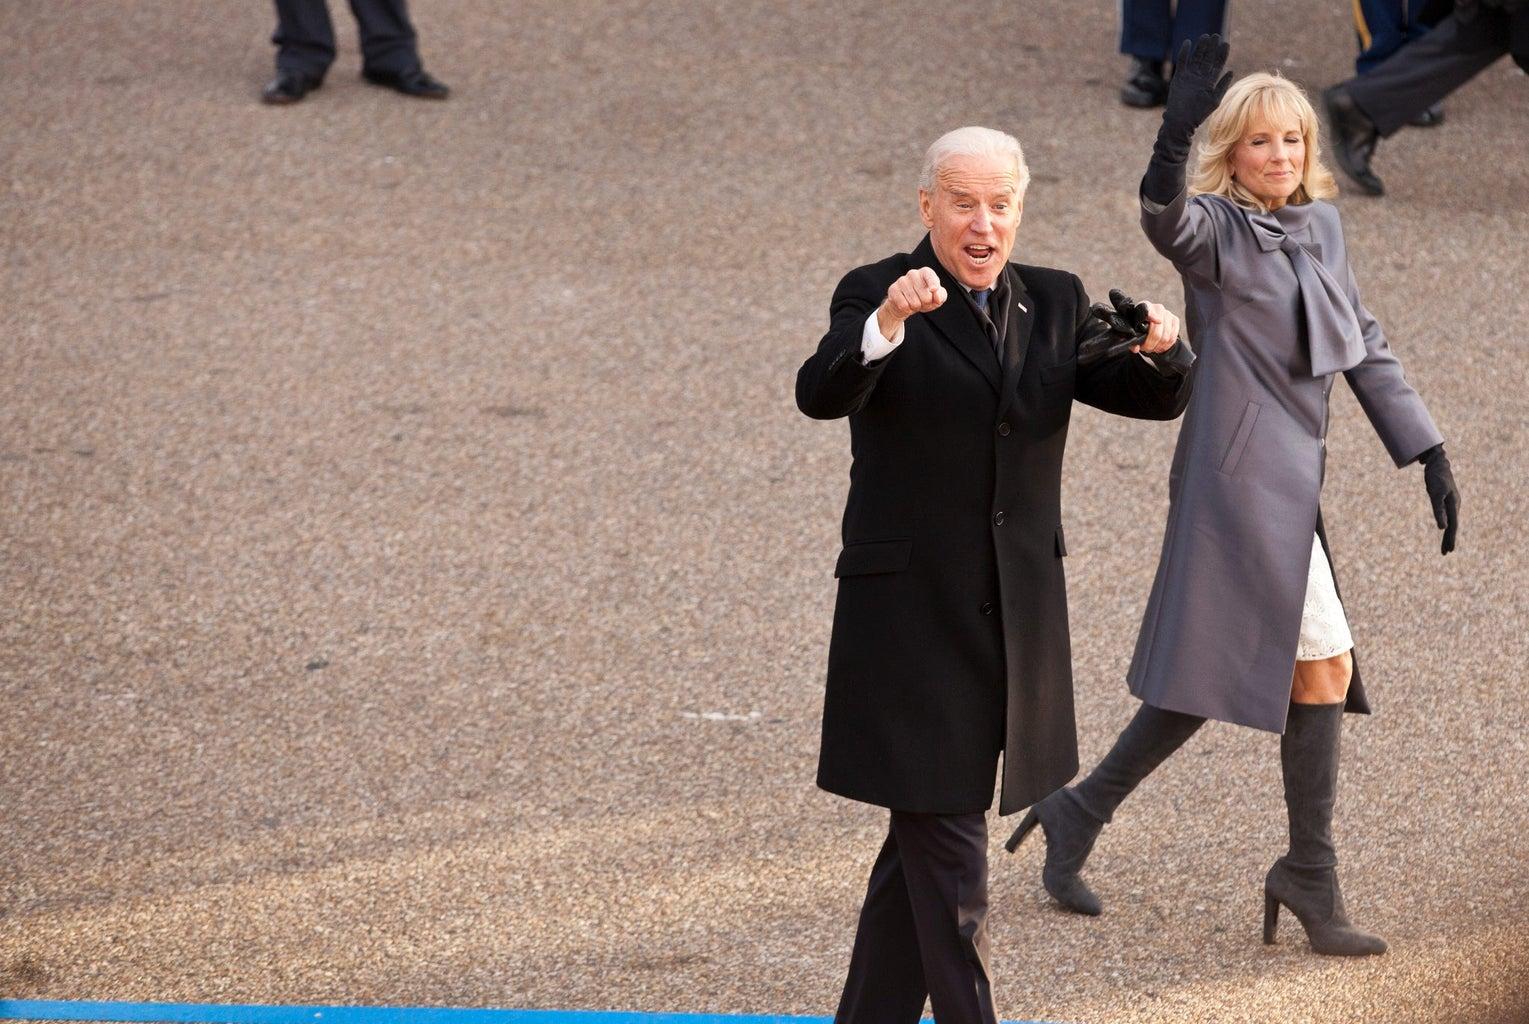 Joe and Jill Biden walking in 2013 inauguration